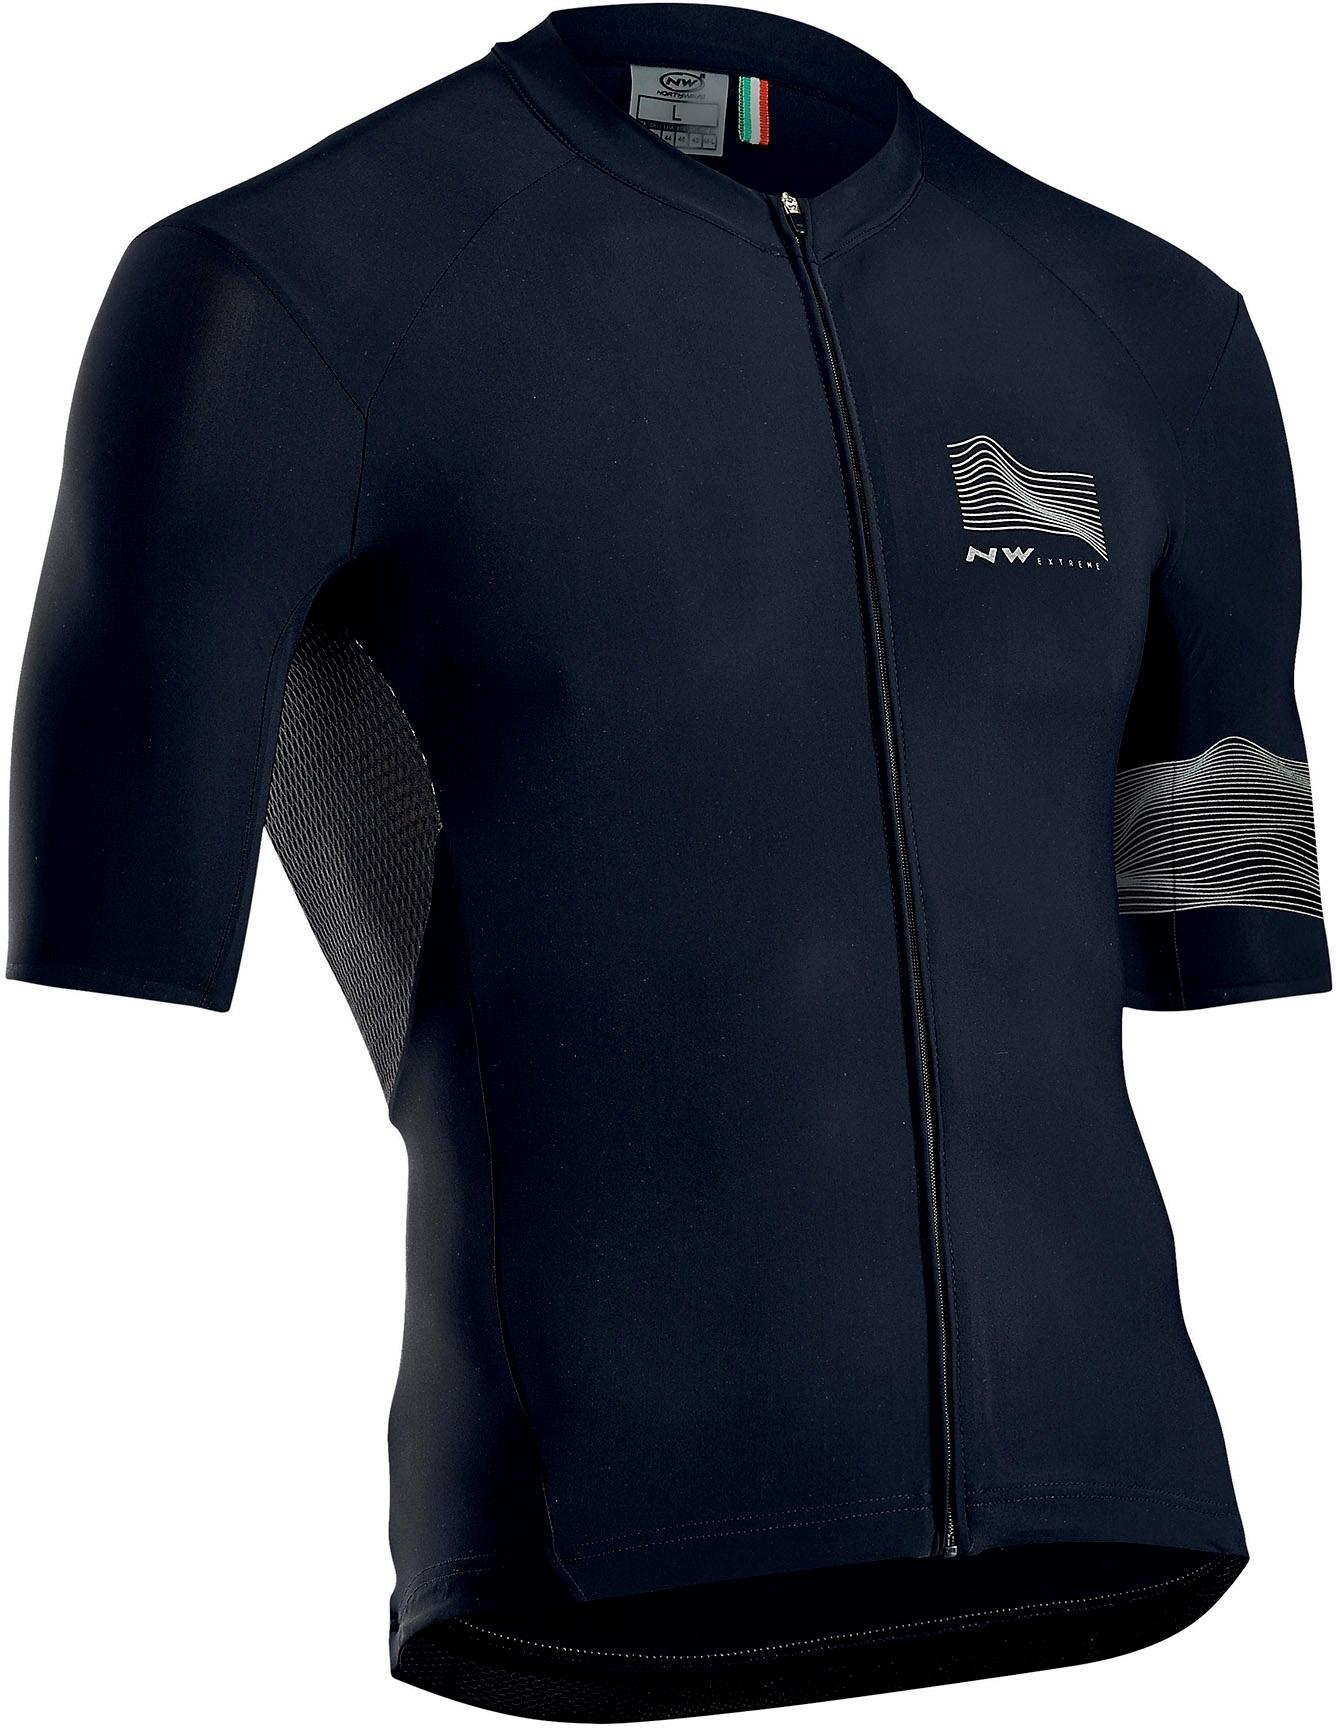 NORTHWAVE Man bike jersey short sleeves EXTREME 3 black